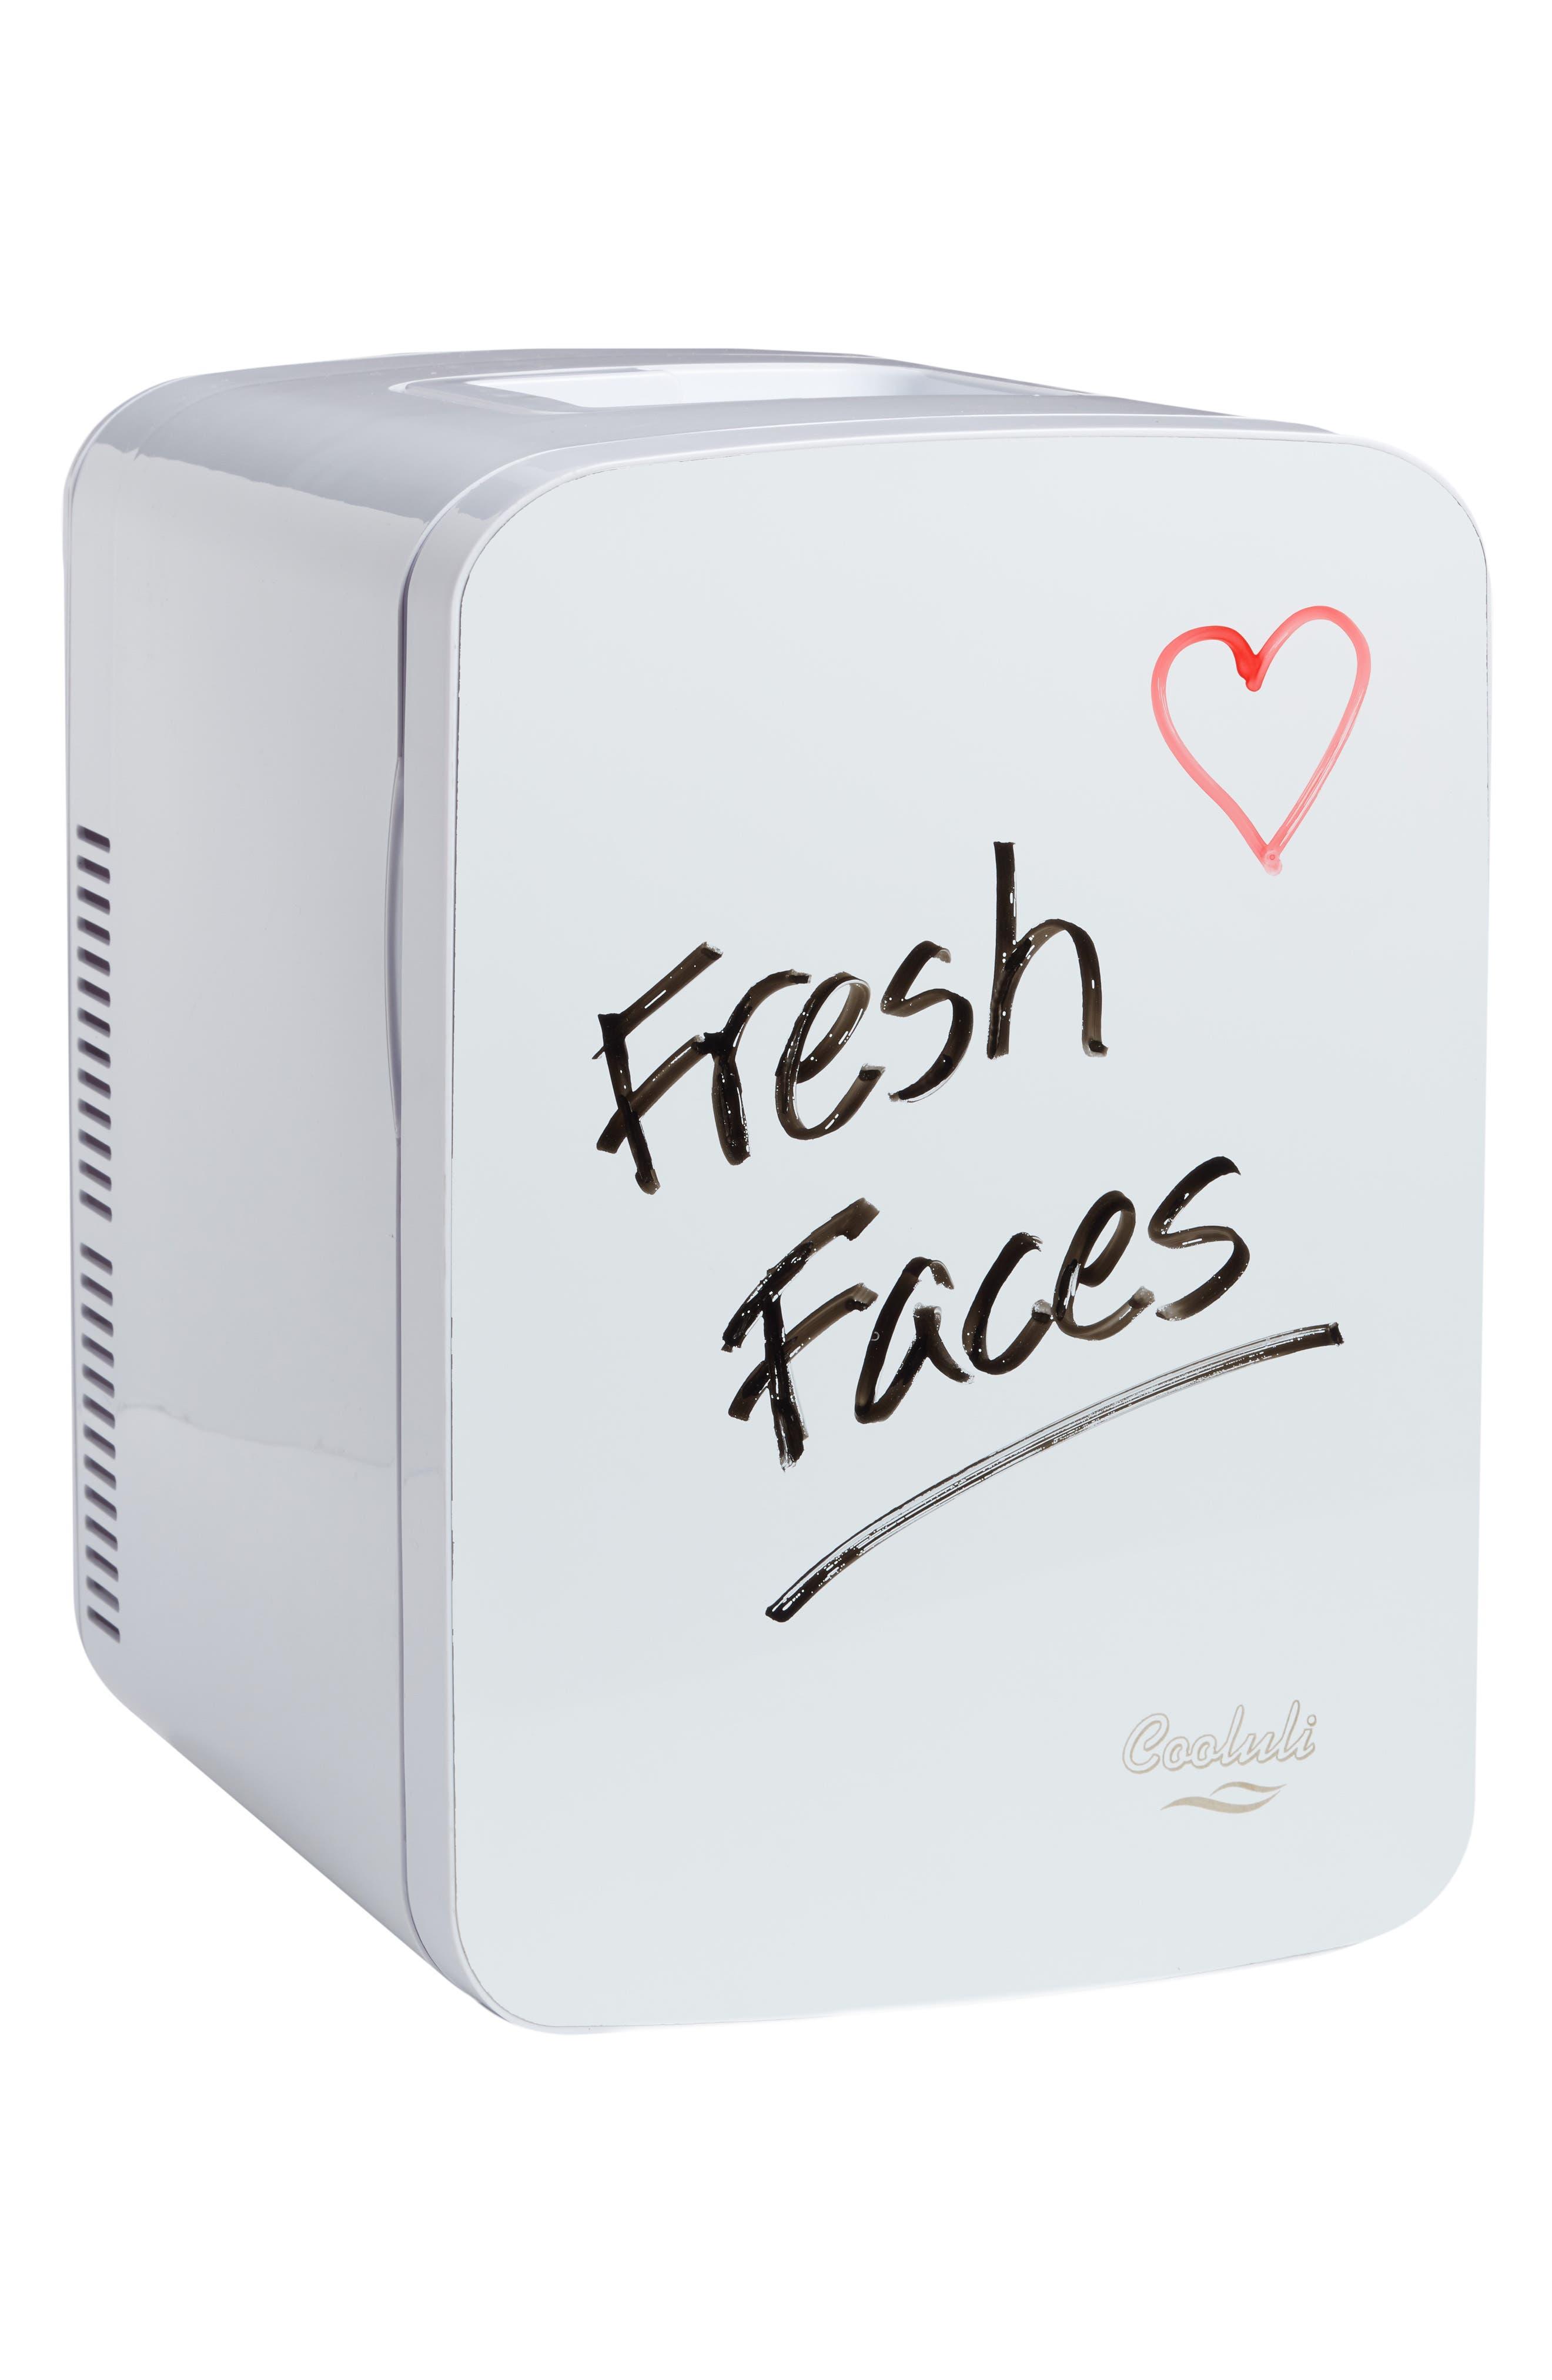 COOLULI, The Vibe Whiteboard 15L Thermoelectric Mini Beauty Fridge & Warmer, Main thumbnail 1, color, 100